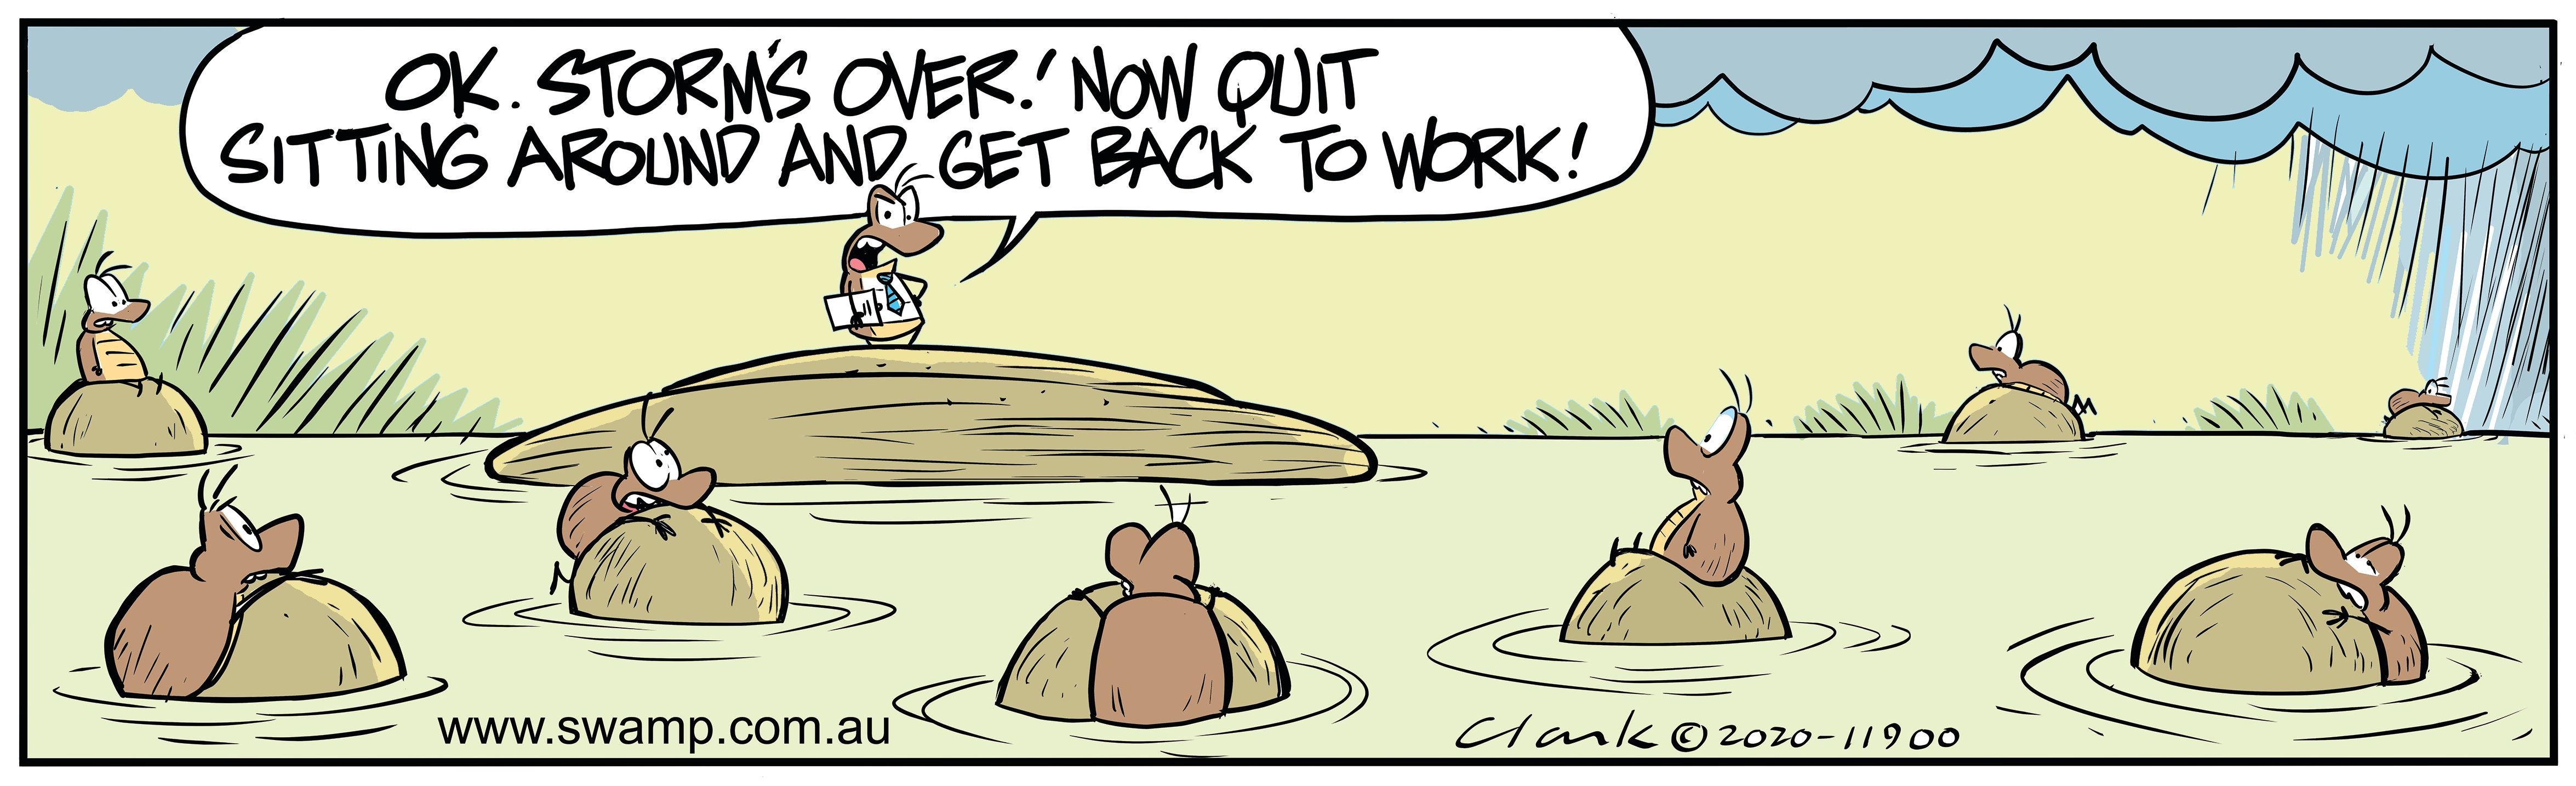 Dungle Beetles Hustled Back to Work